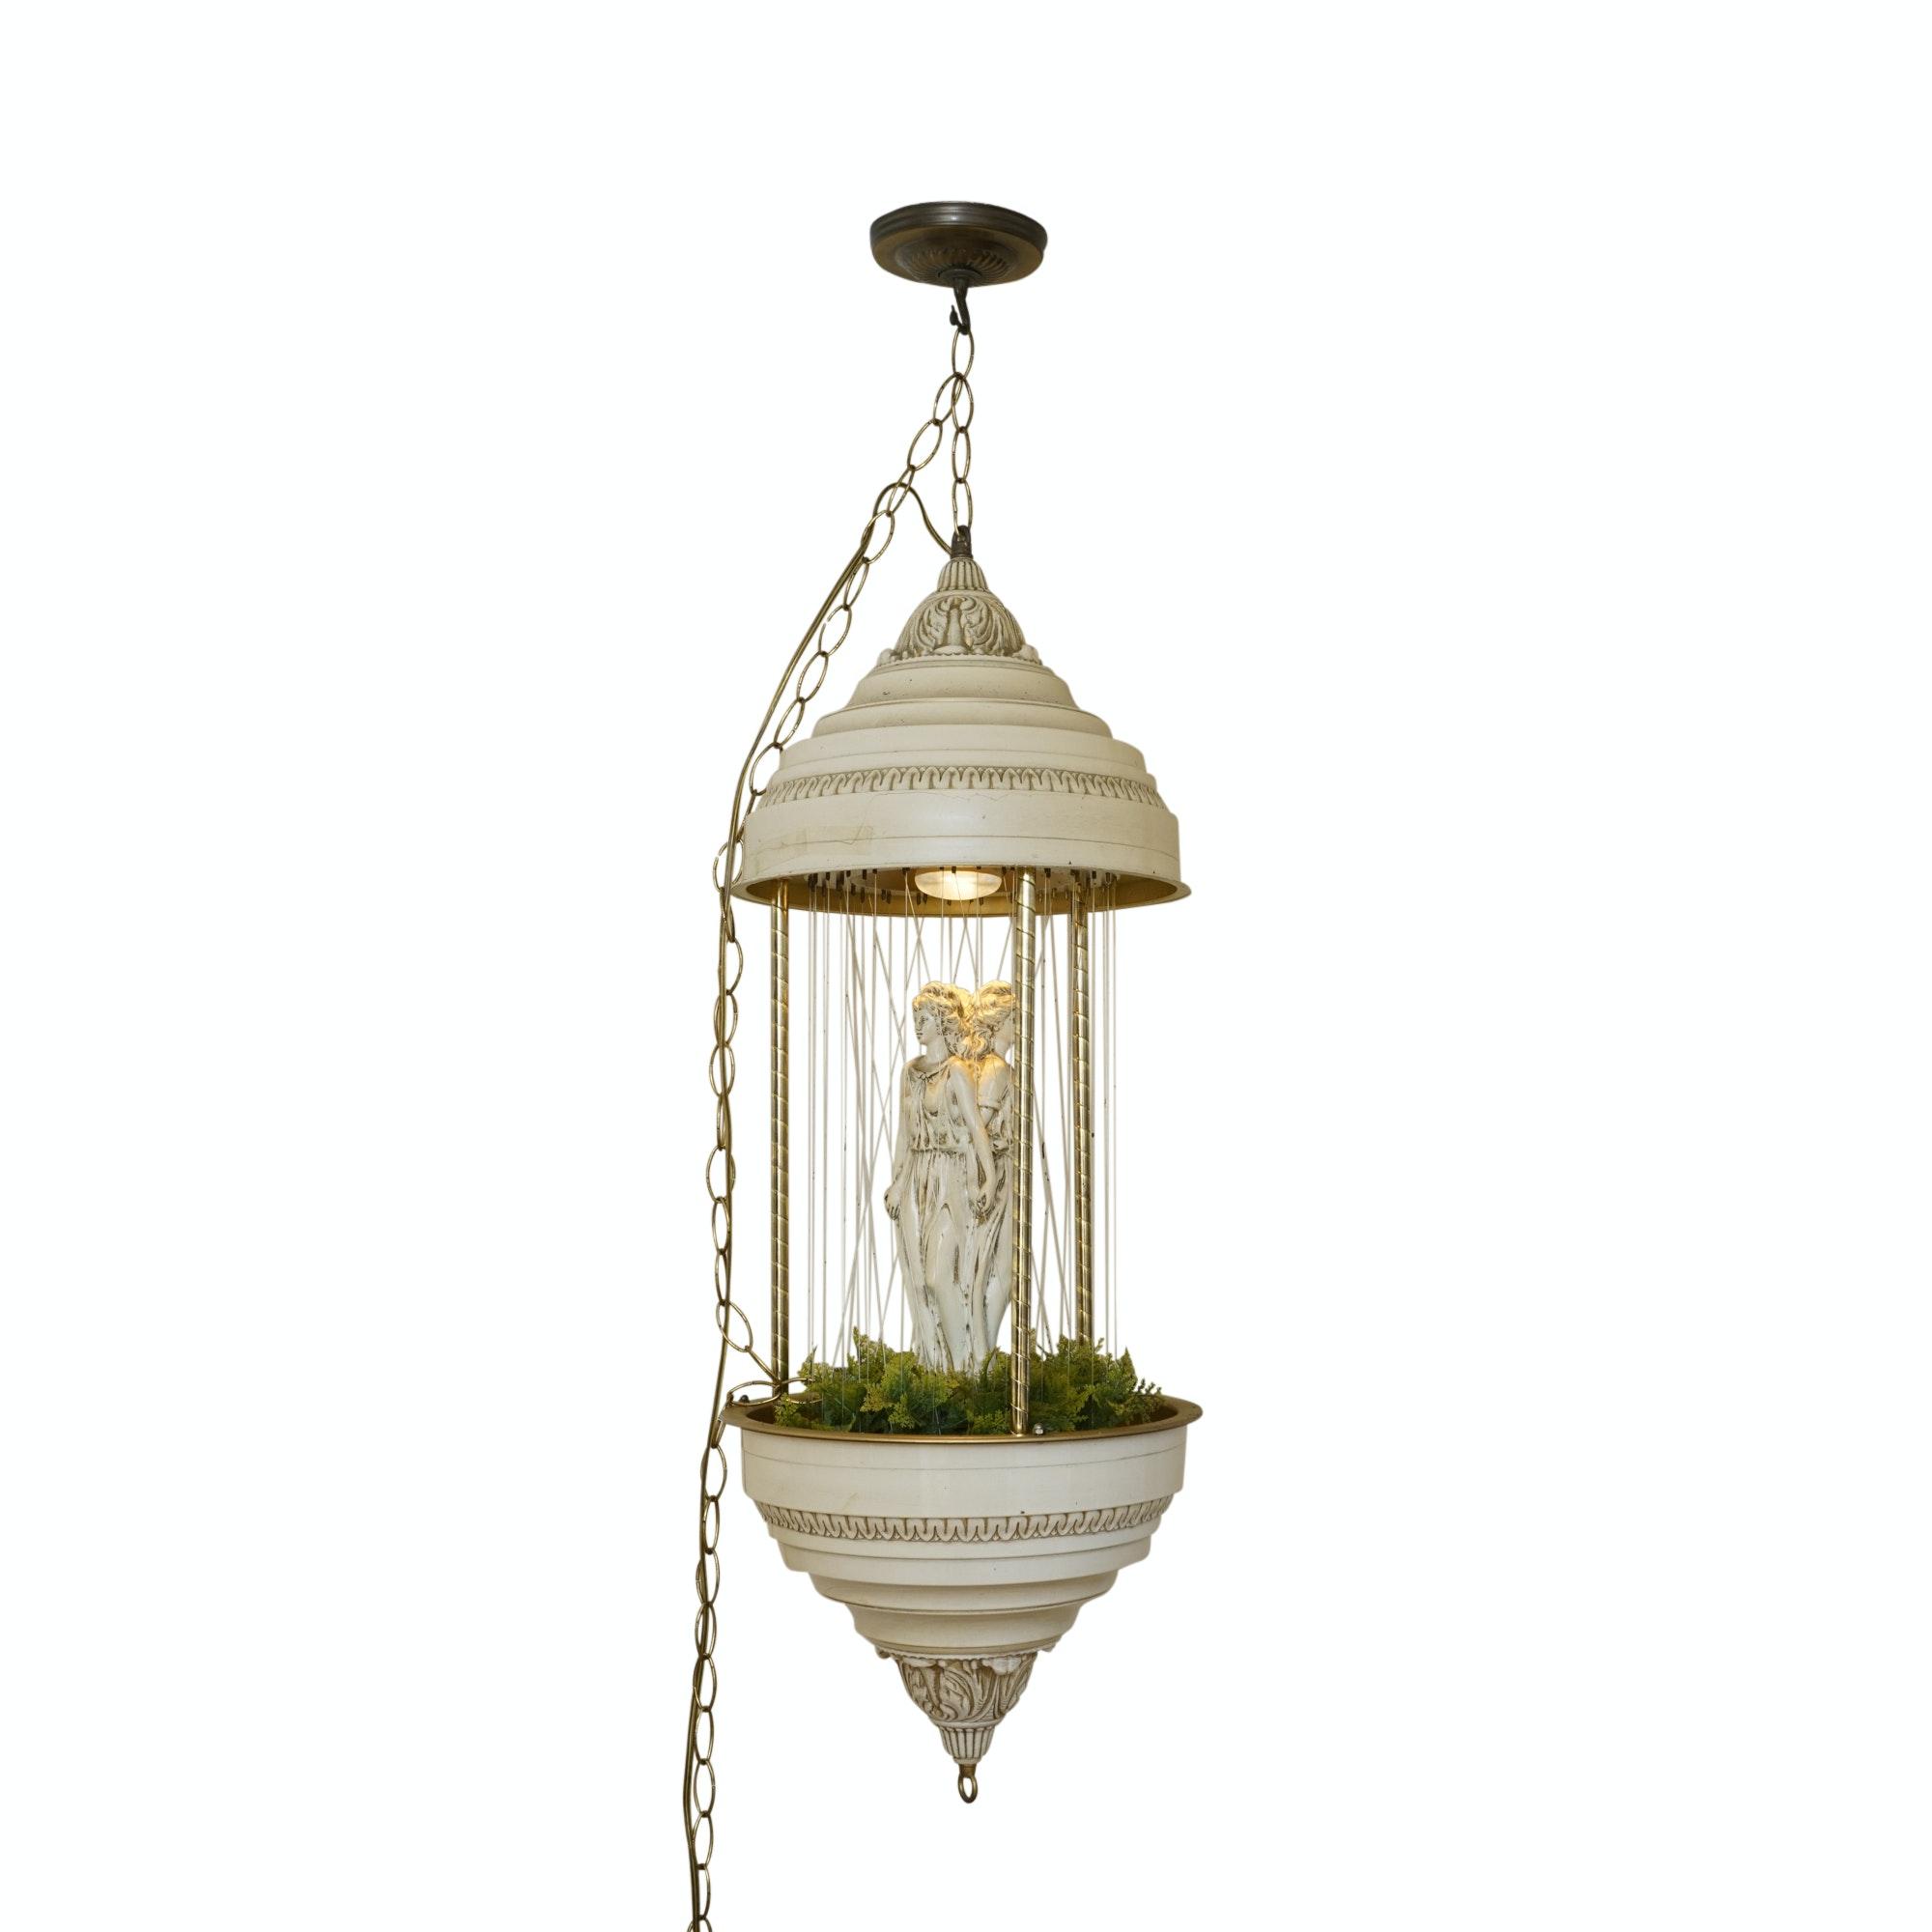 Vintage Oil Rain Lamp Featuring the Three Graces